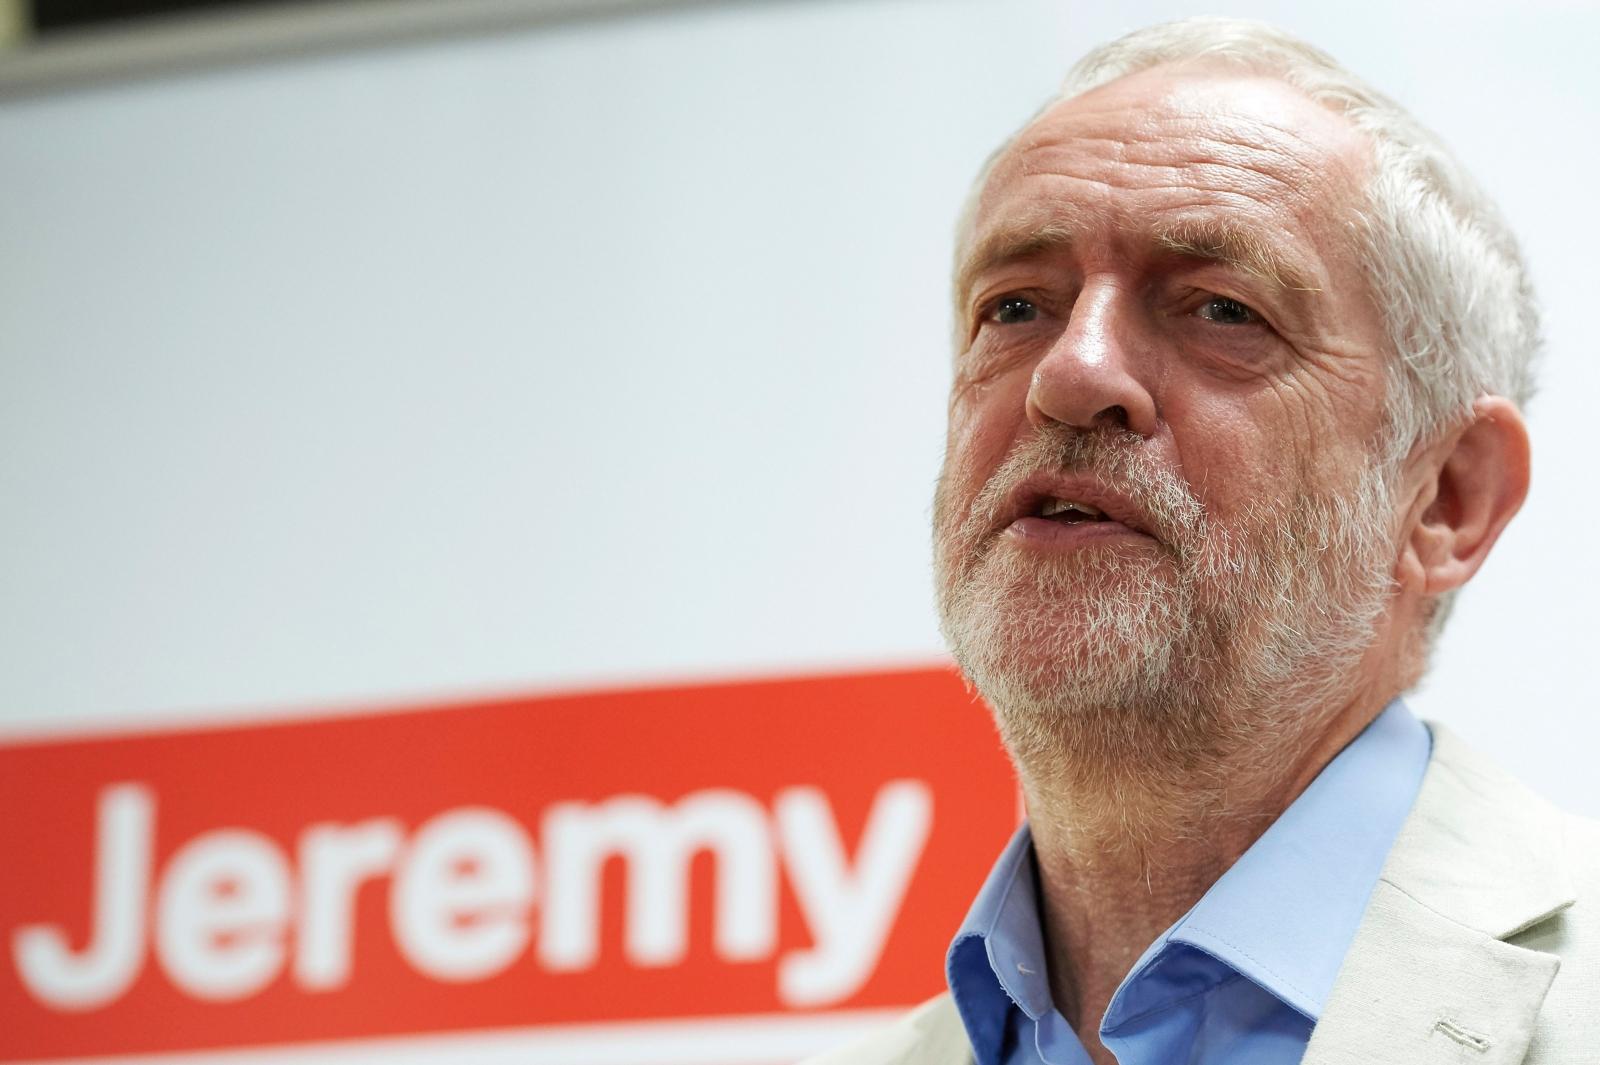 Jeremy Corbyn Labour leadership